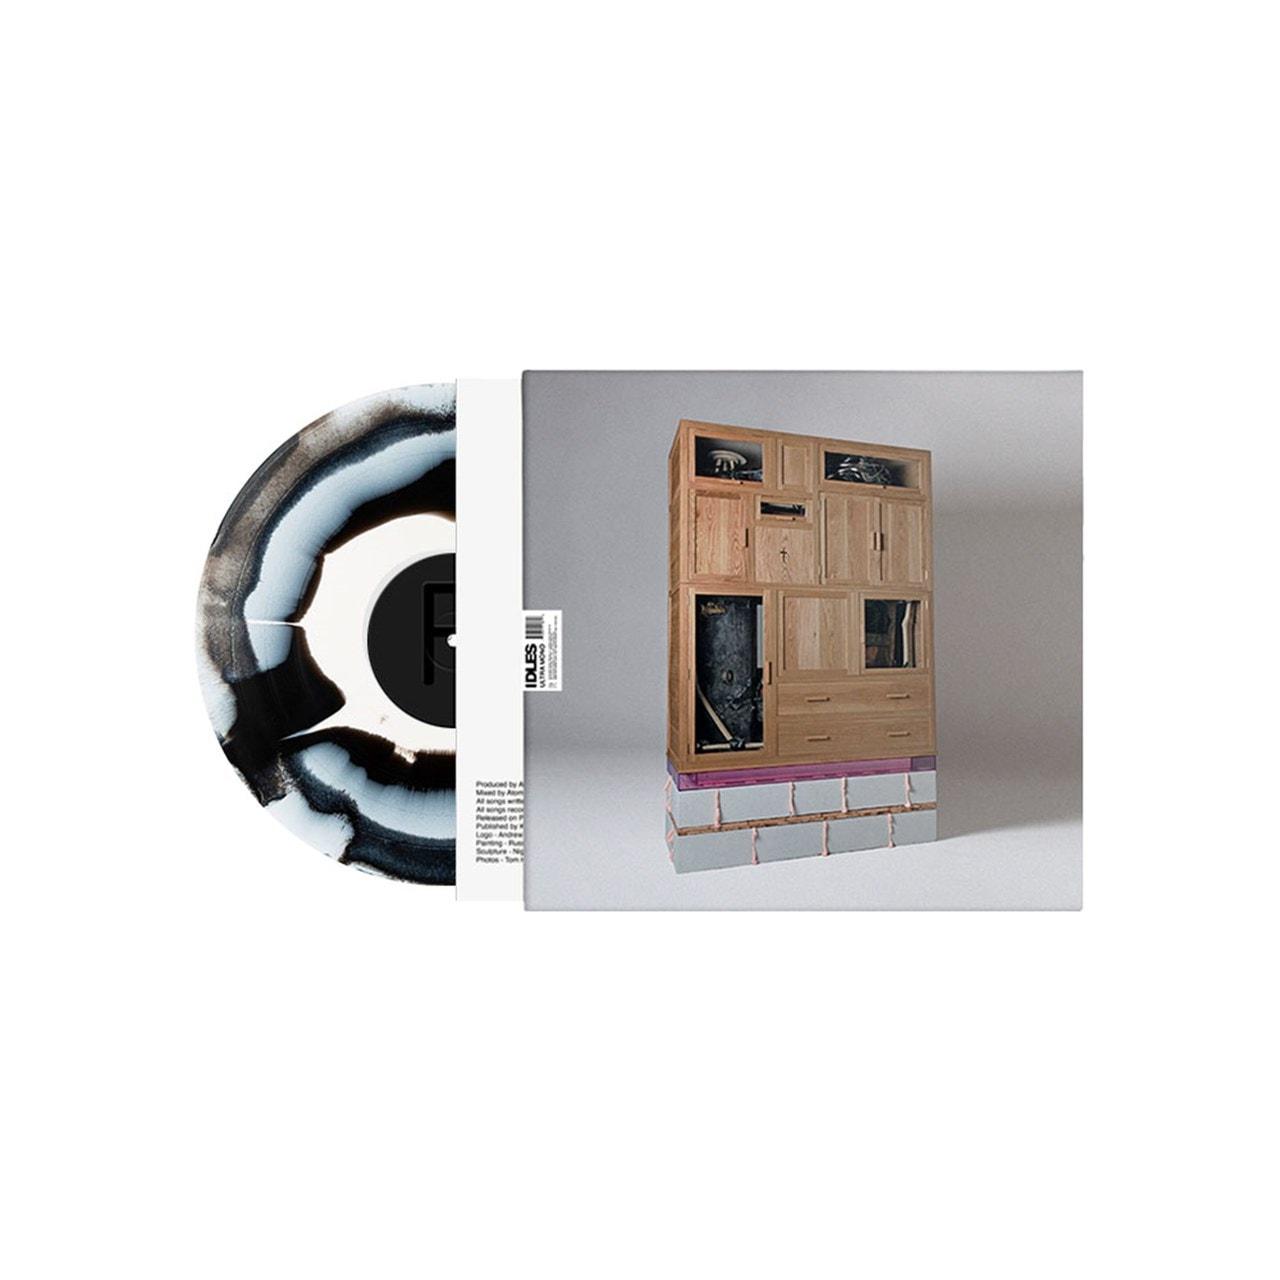 Ultra Mono: Signed Limited Edition Vortex Vinyl - 2